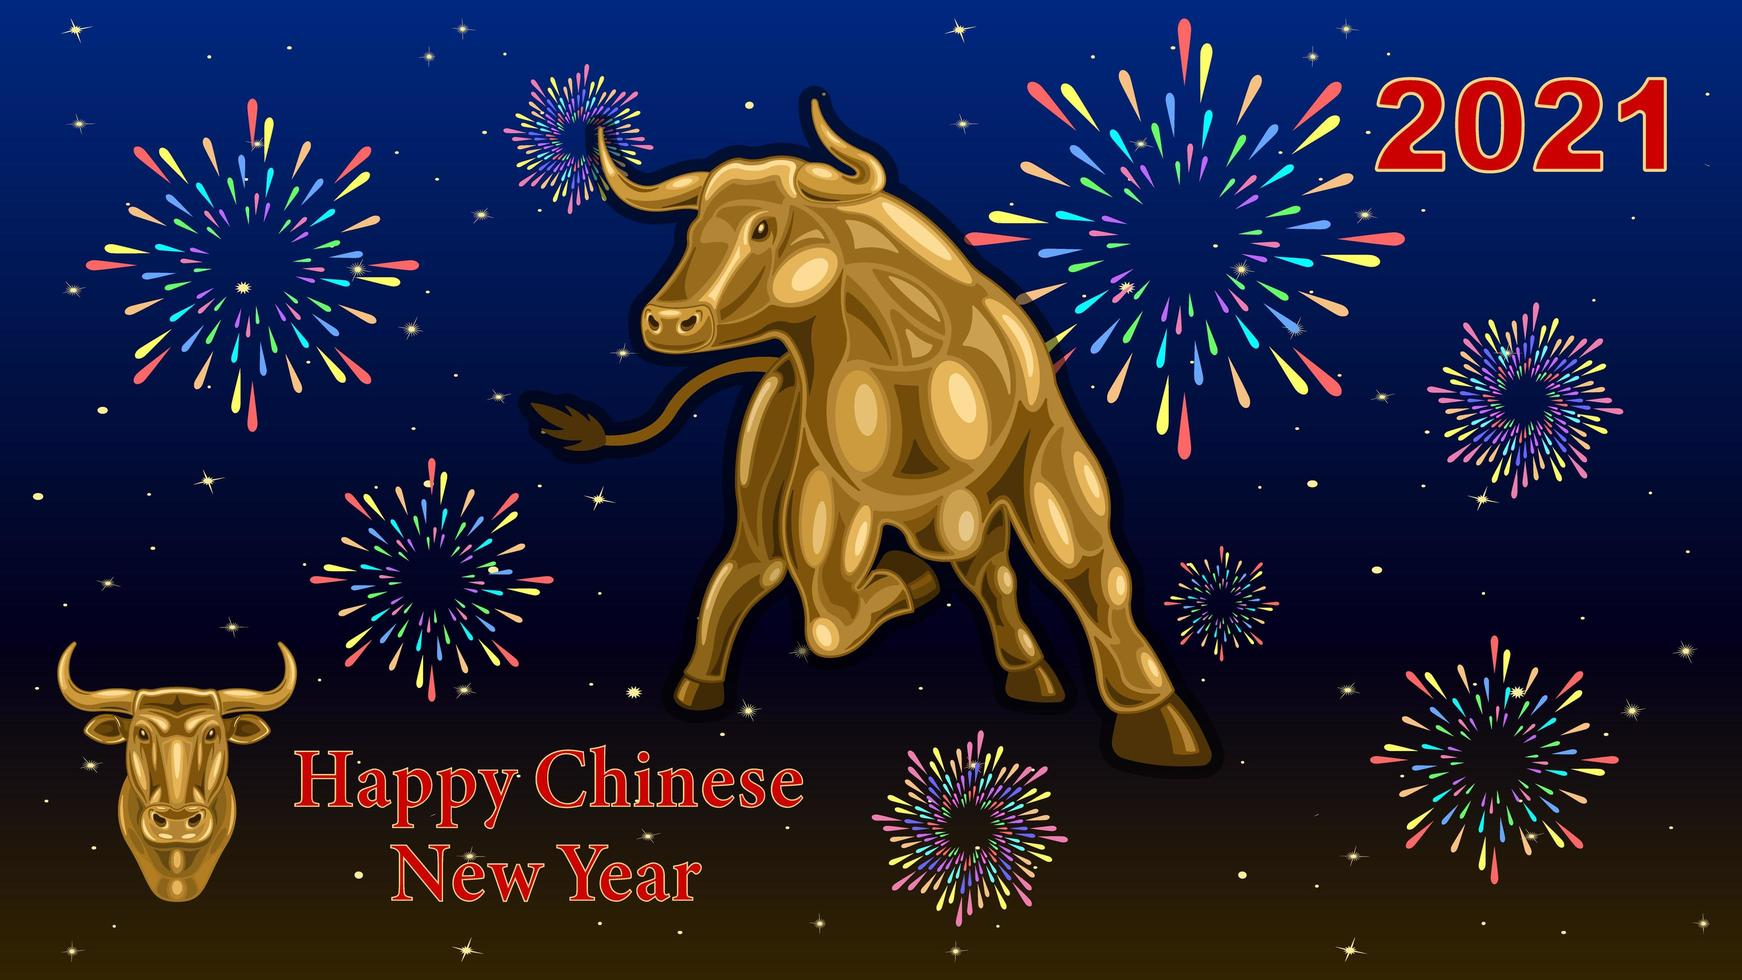 metall tjur, oxe, 2021 kinesiska nyår fyrverkeri affisch vektor